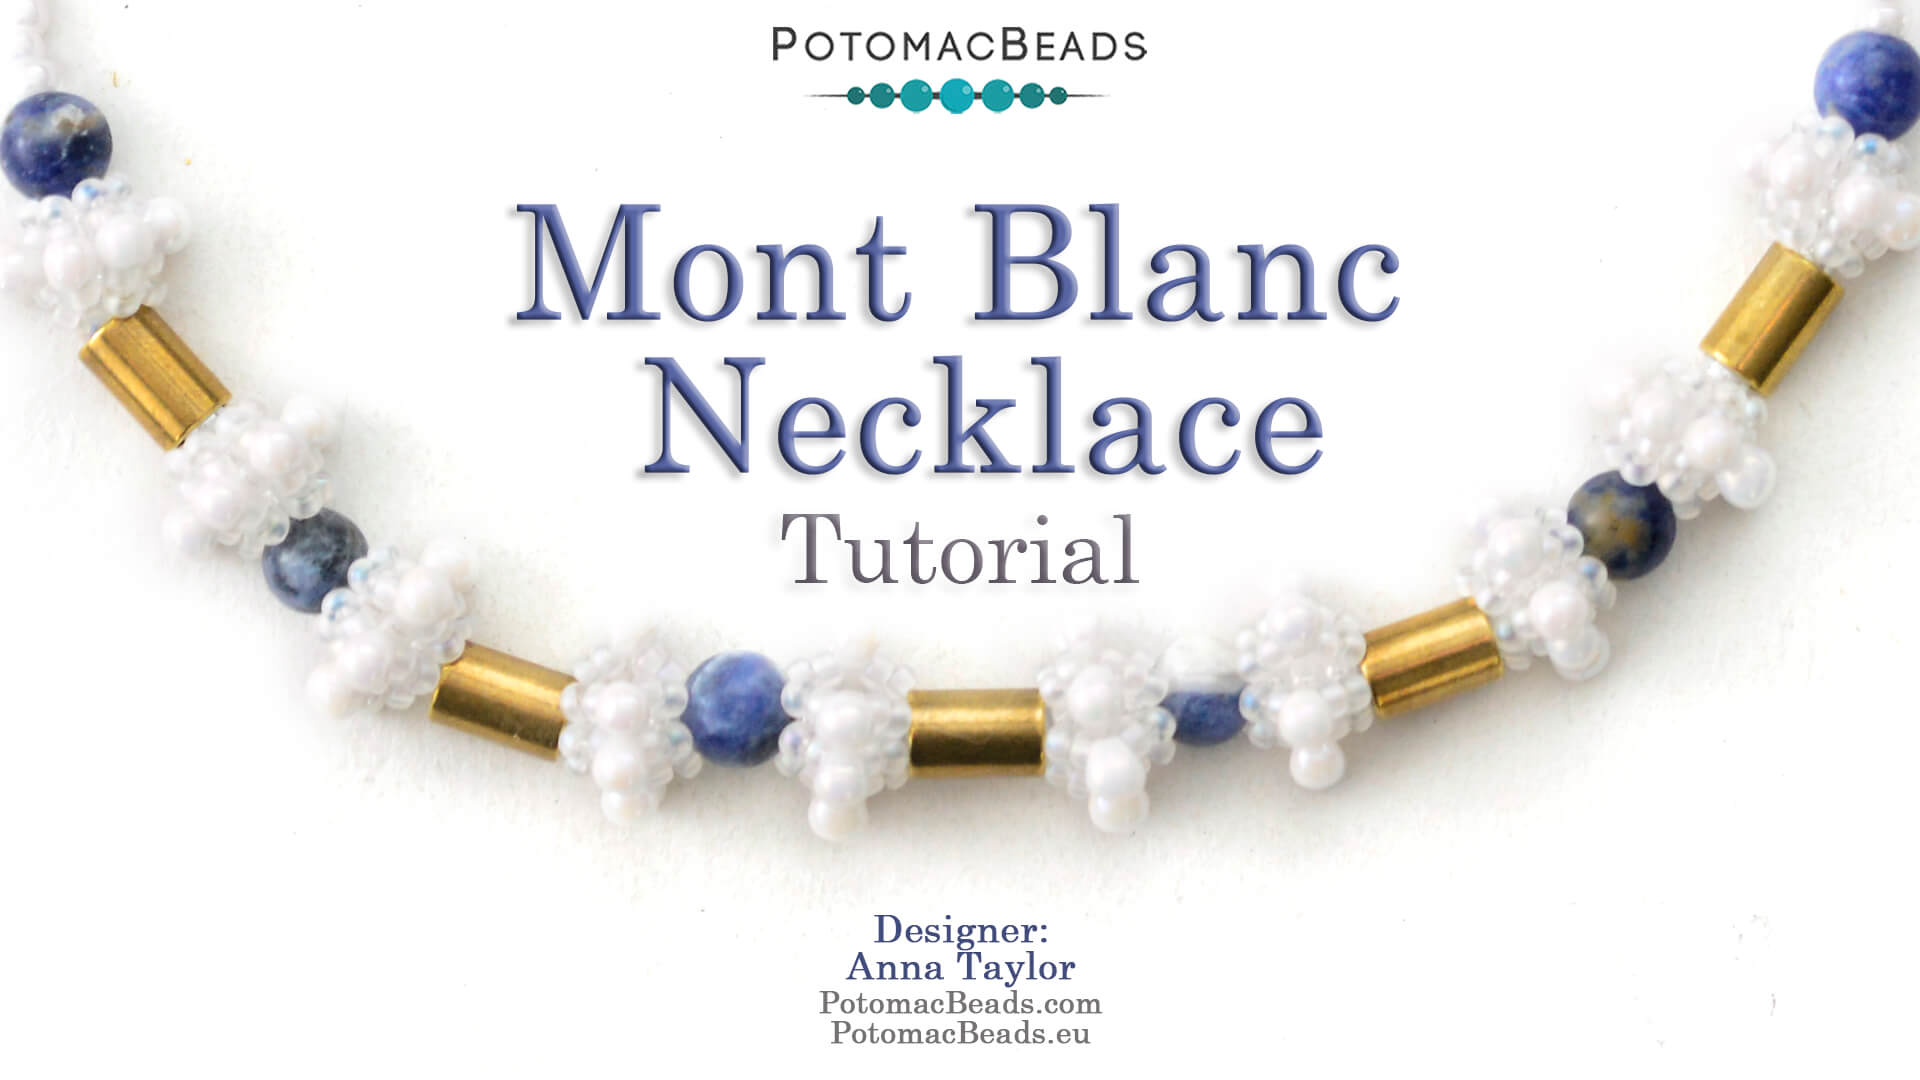 How to Bead Jewelry / Beading Tutorials & Jewel Making Videos / Bead Weaving Tutorials & Necklace Tutorial / Mont Blanc Necklace Tutorial